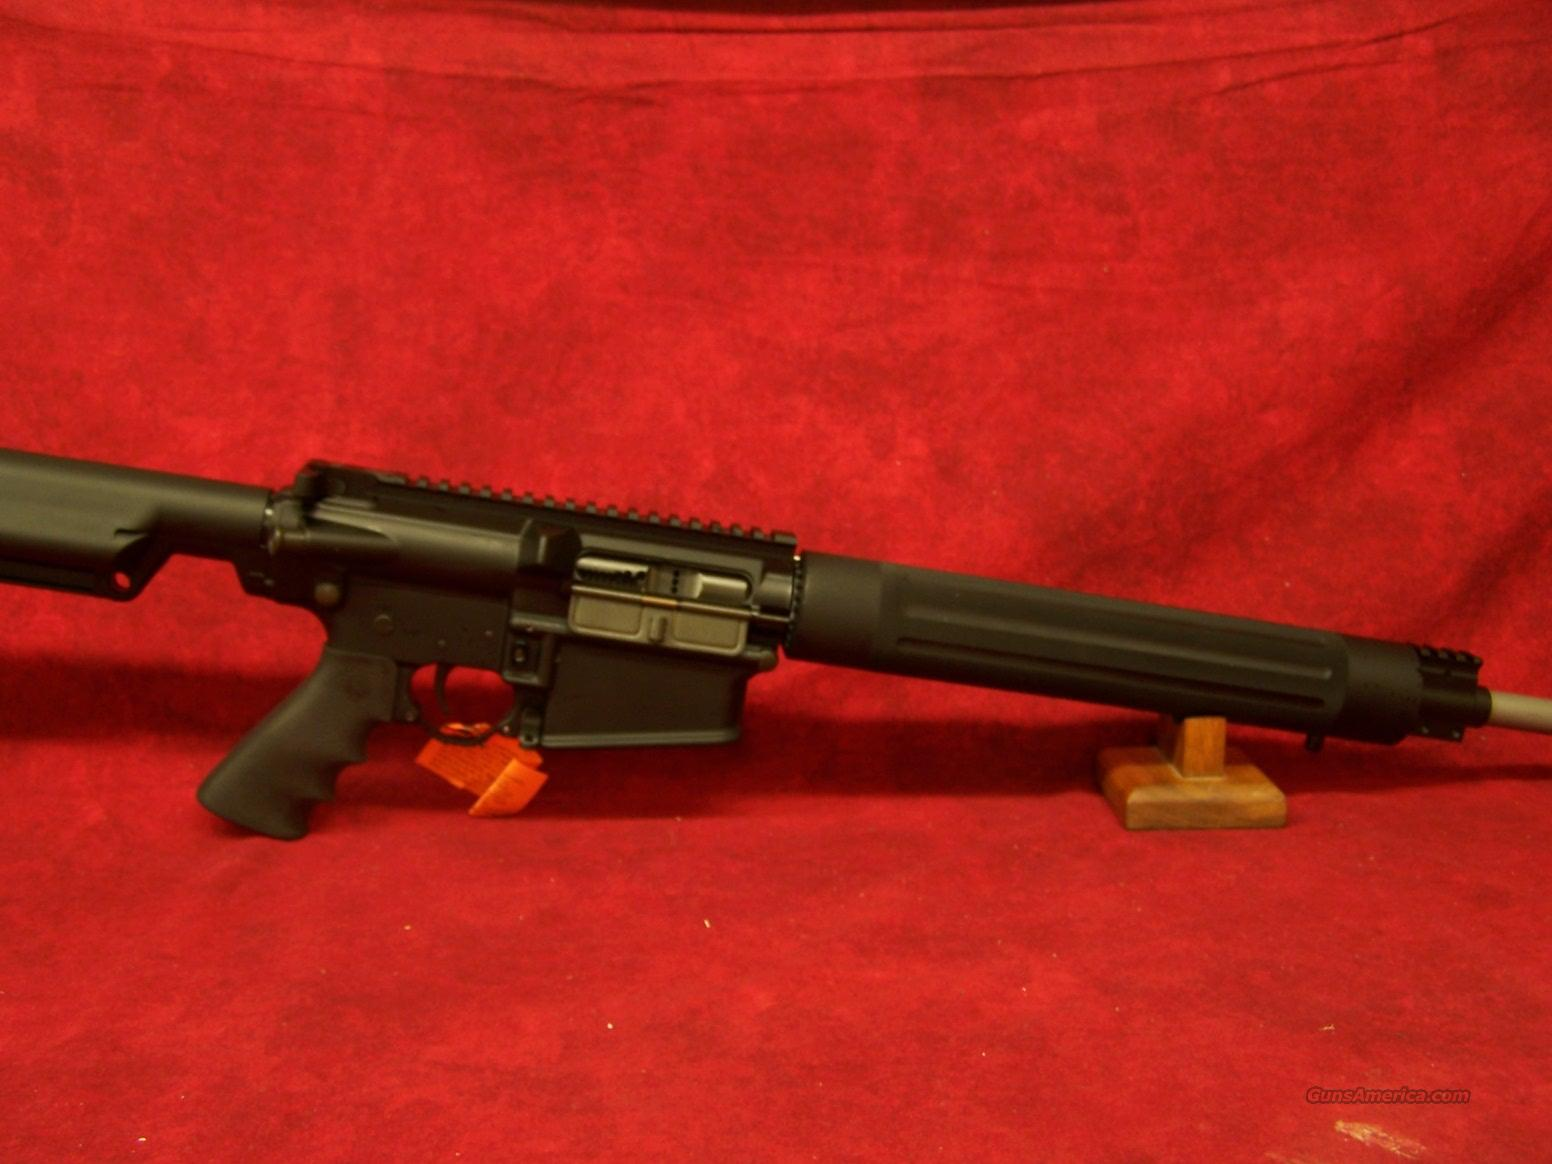 Rock River Arms LAR-8 Predator HP .308 / 7.62mm w/Operator A2 Stock  Guns > Rifles > Rock River Arms Rifles